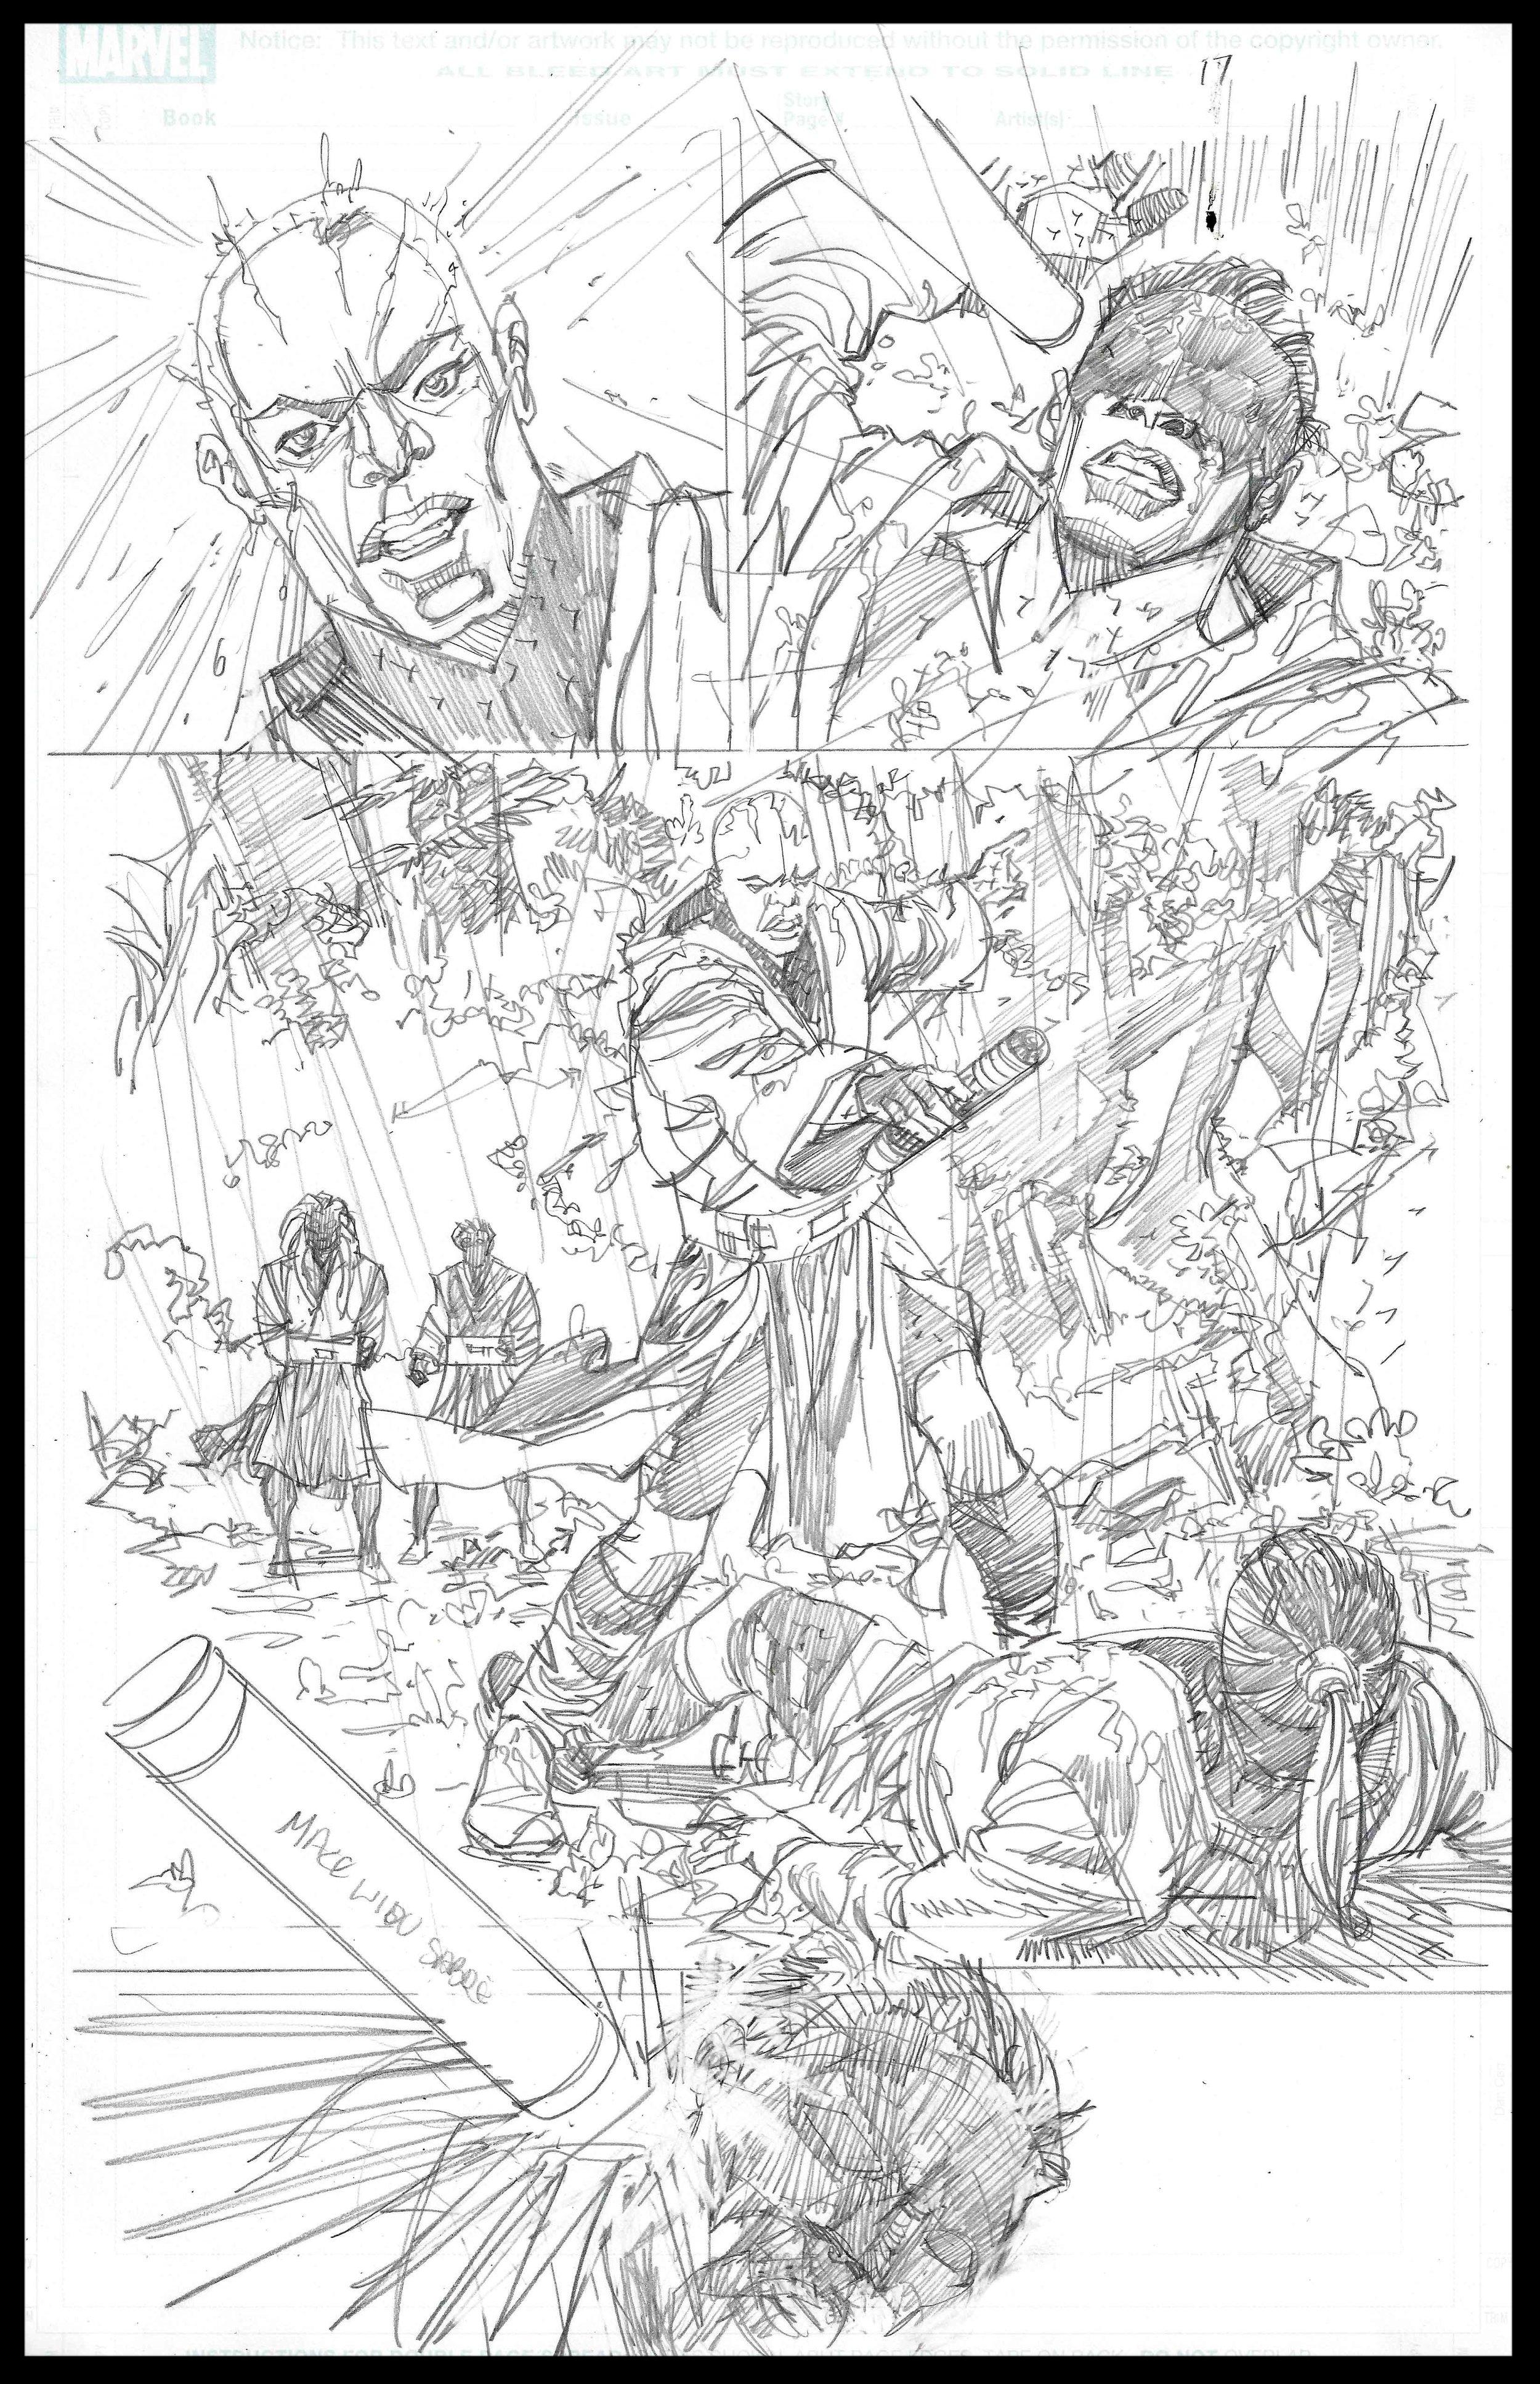 Mace Windu #4 - Page 17 - Pencils